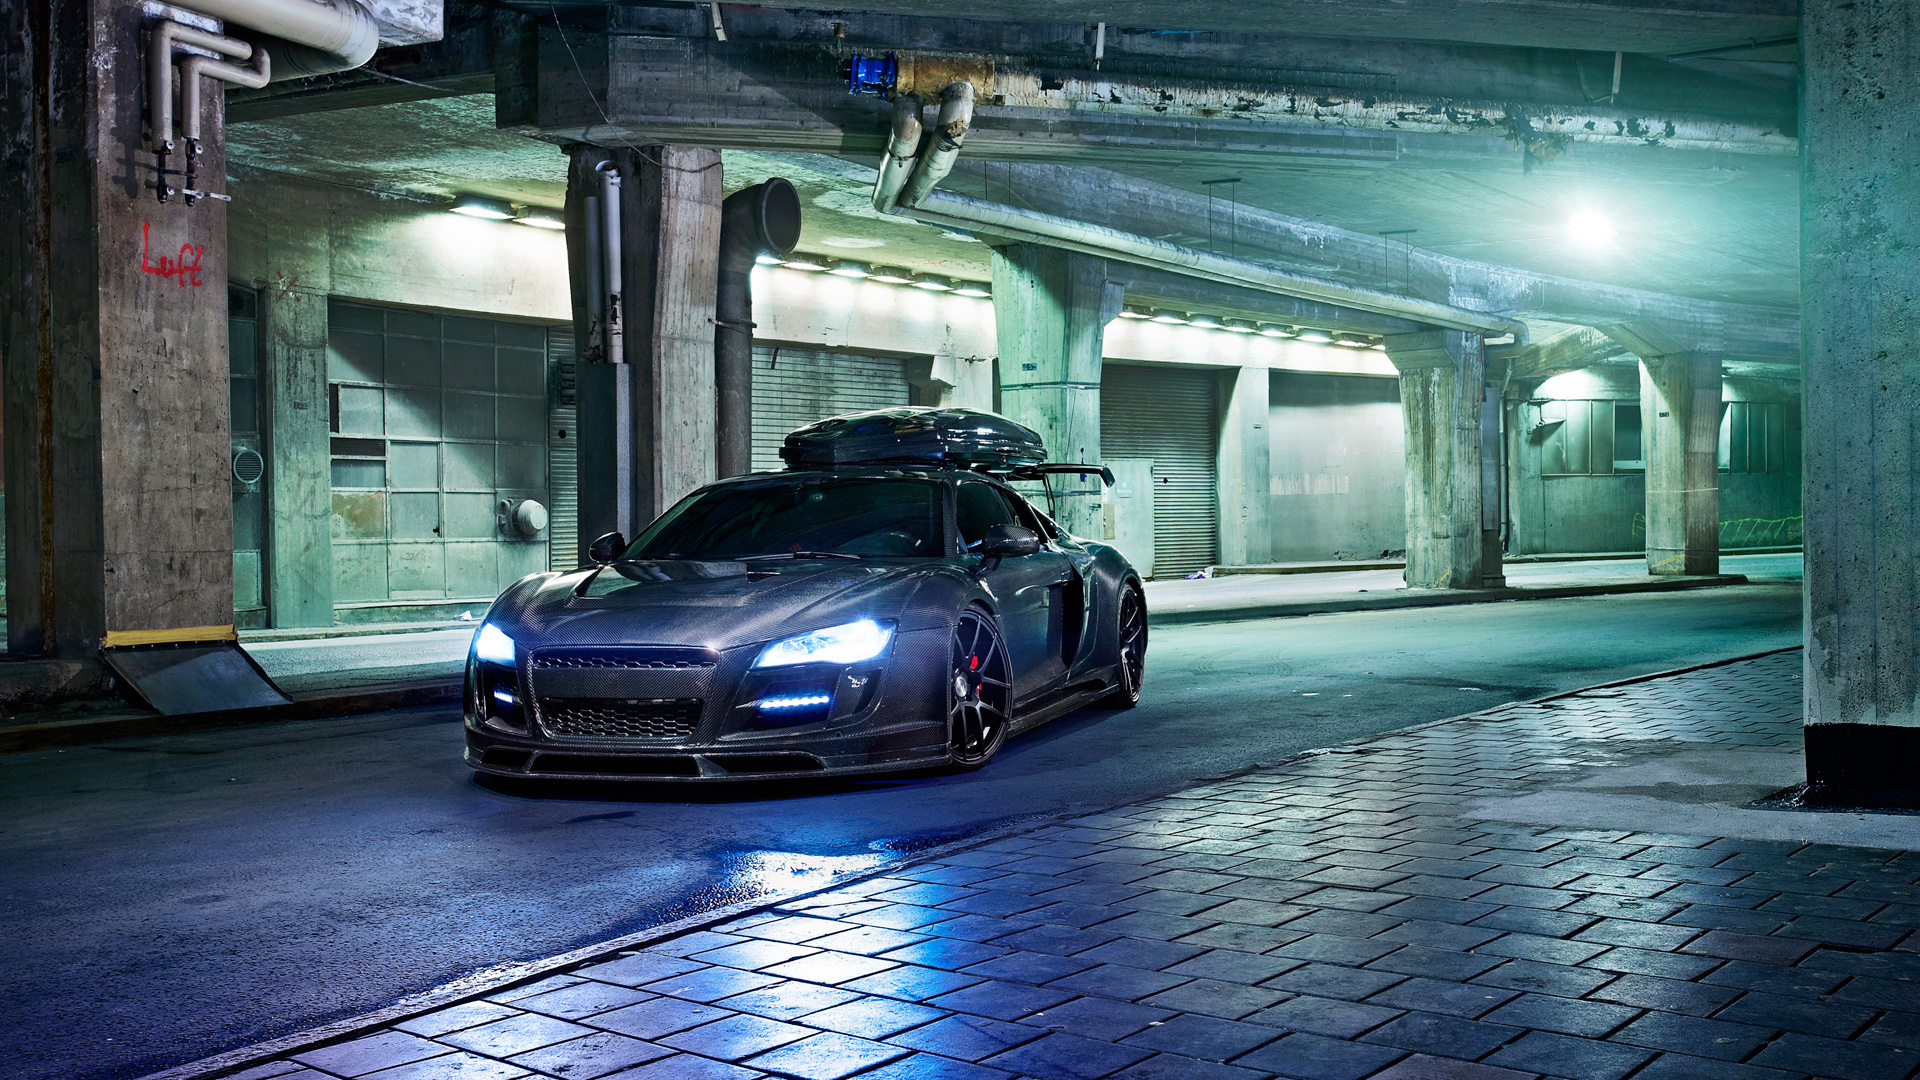 Audi-R-by-Jon-Olsson-HD-http-imashon-com-w-auto-audi-r-by-jon-olsson-hd-ht-wallpaper-wp3602805